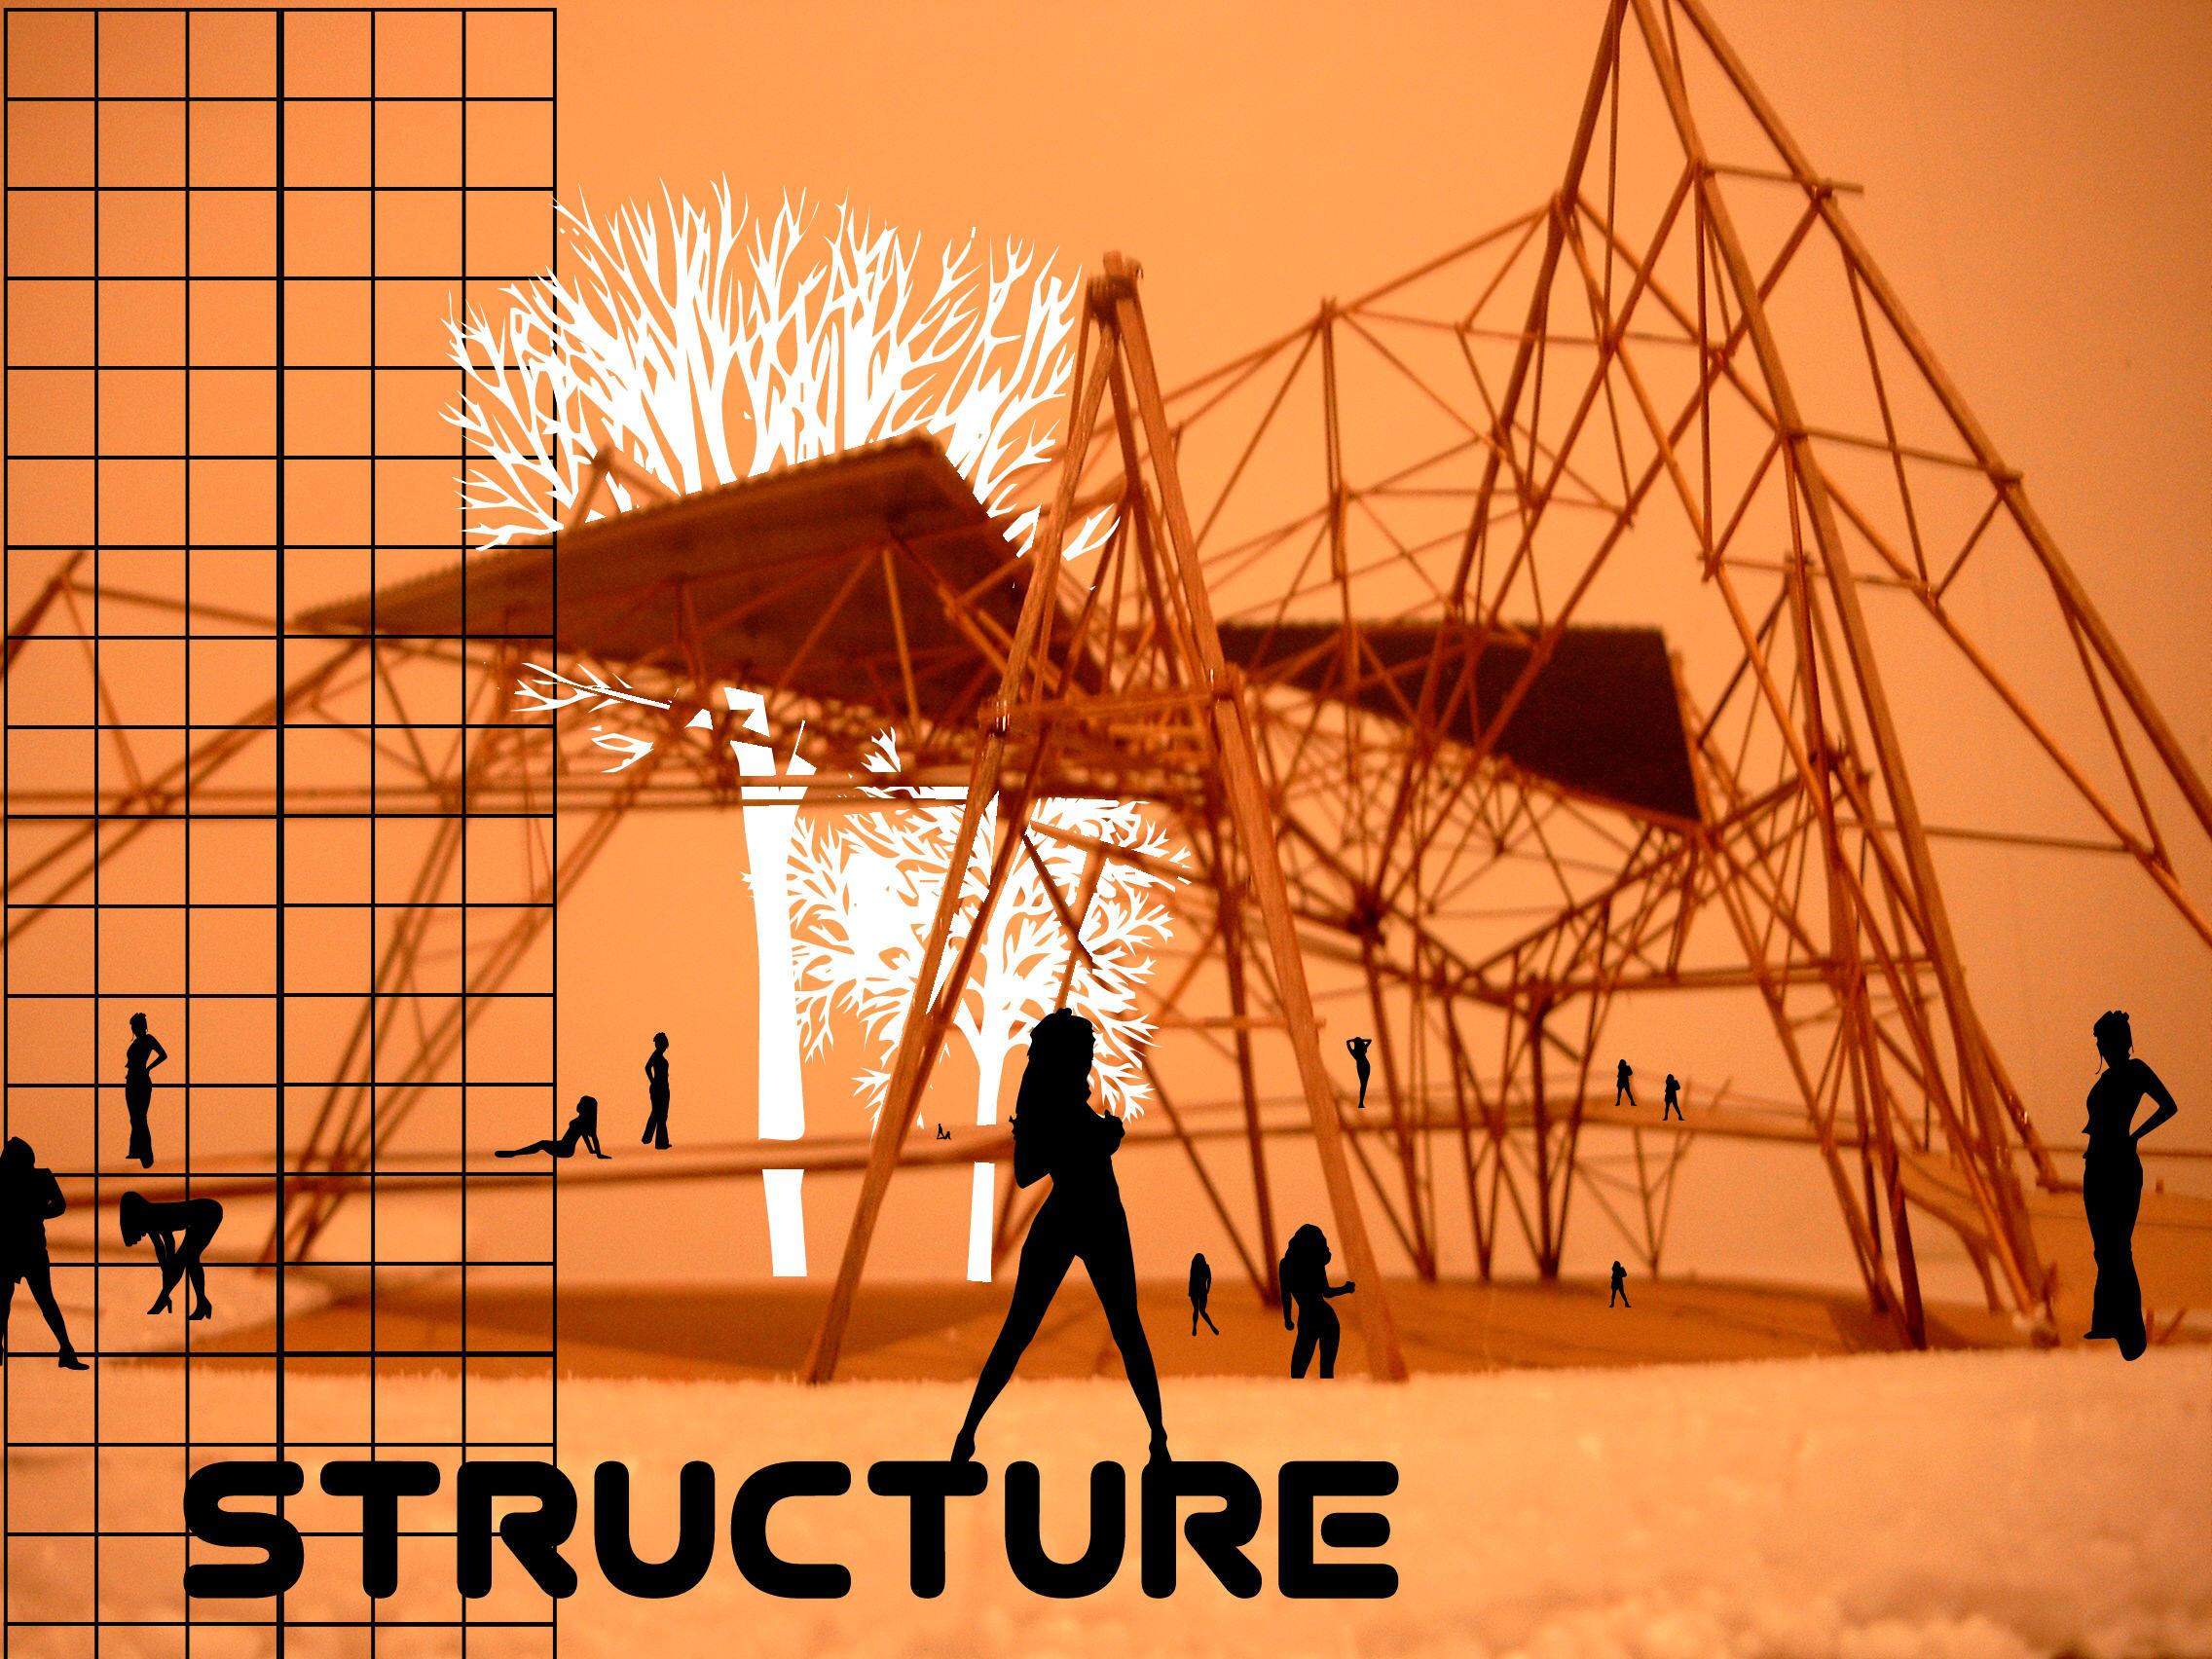 structure by shelbyfuckinparadize